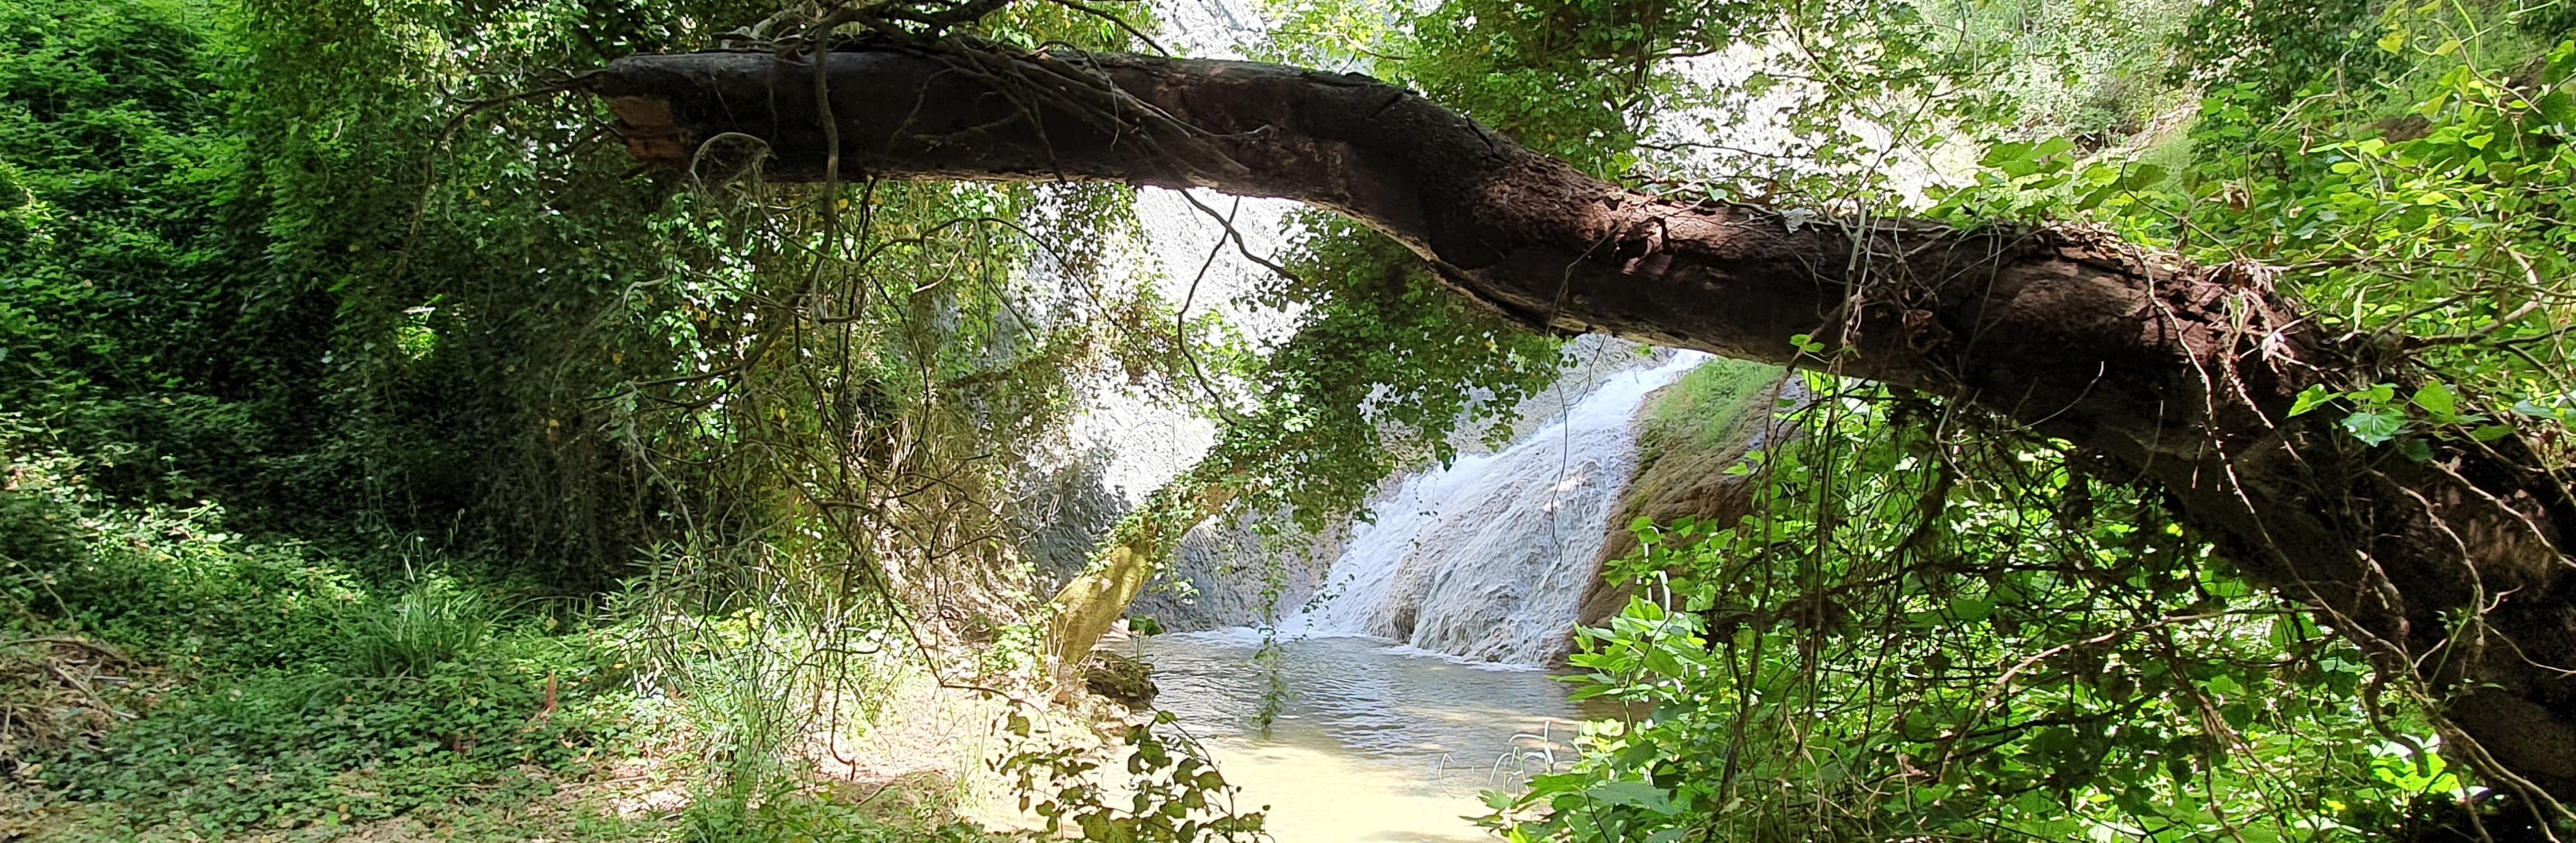 Wandeling3-Banner03-Waterfalls